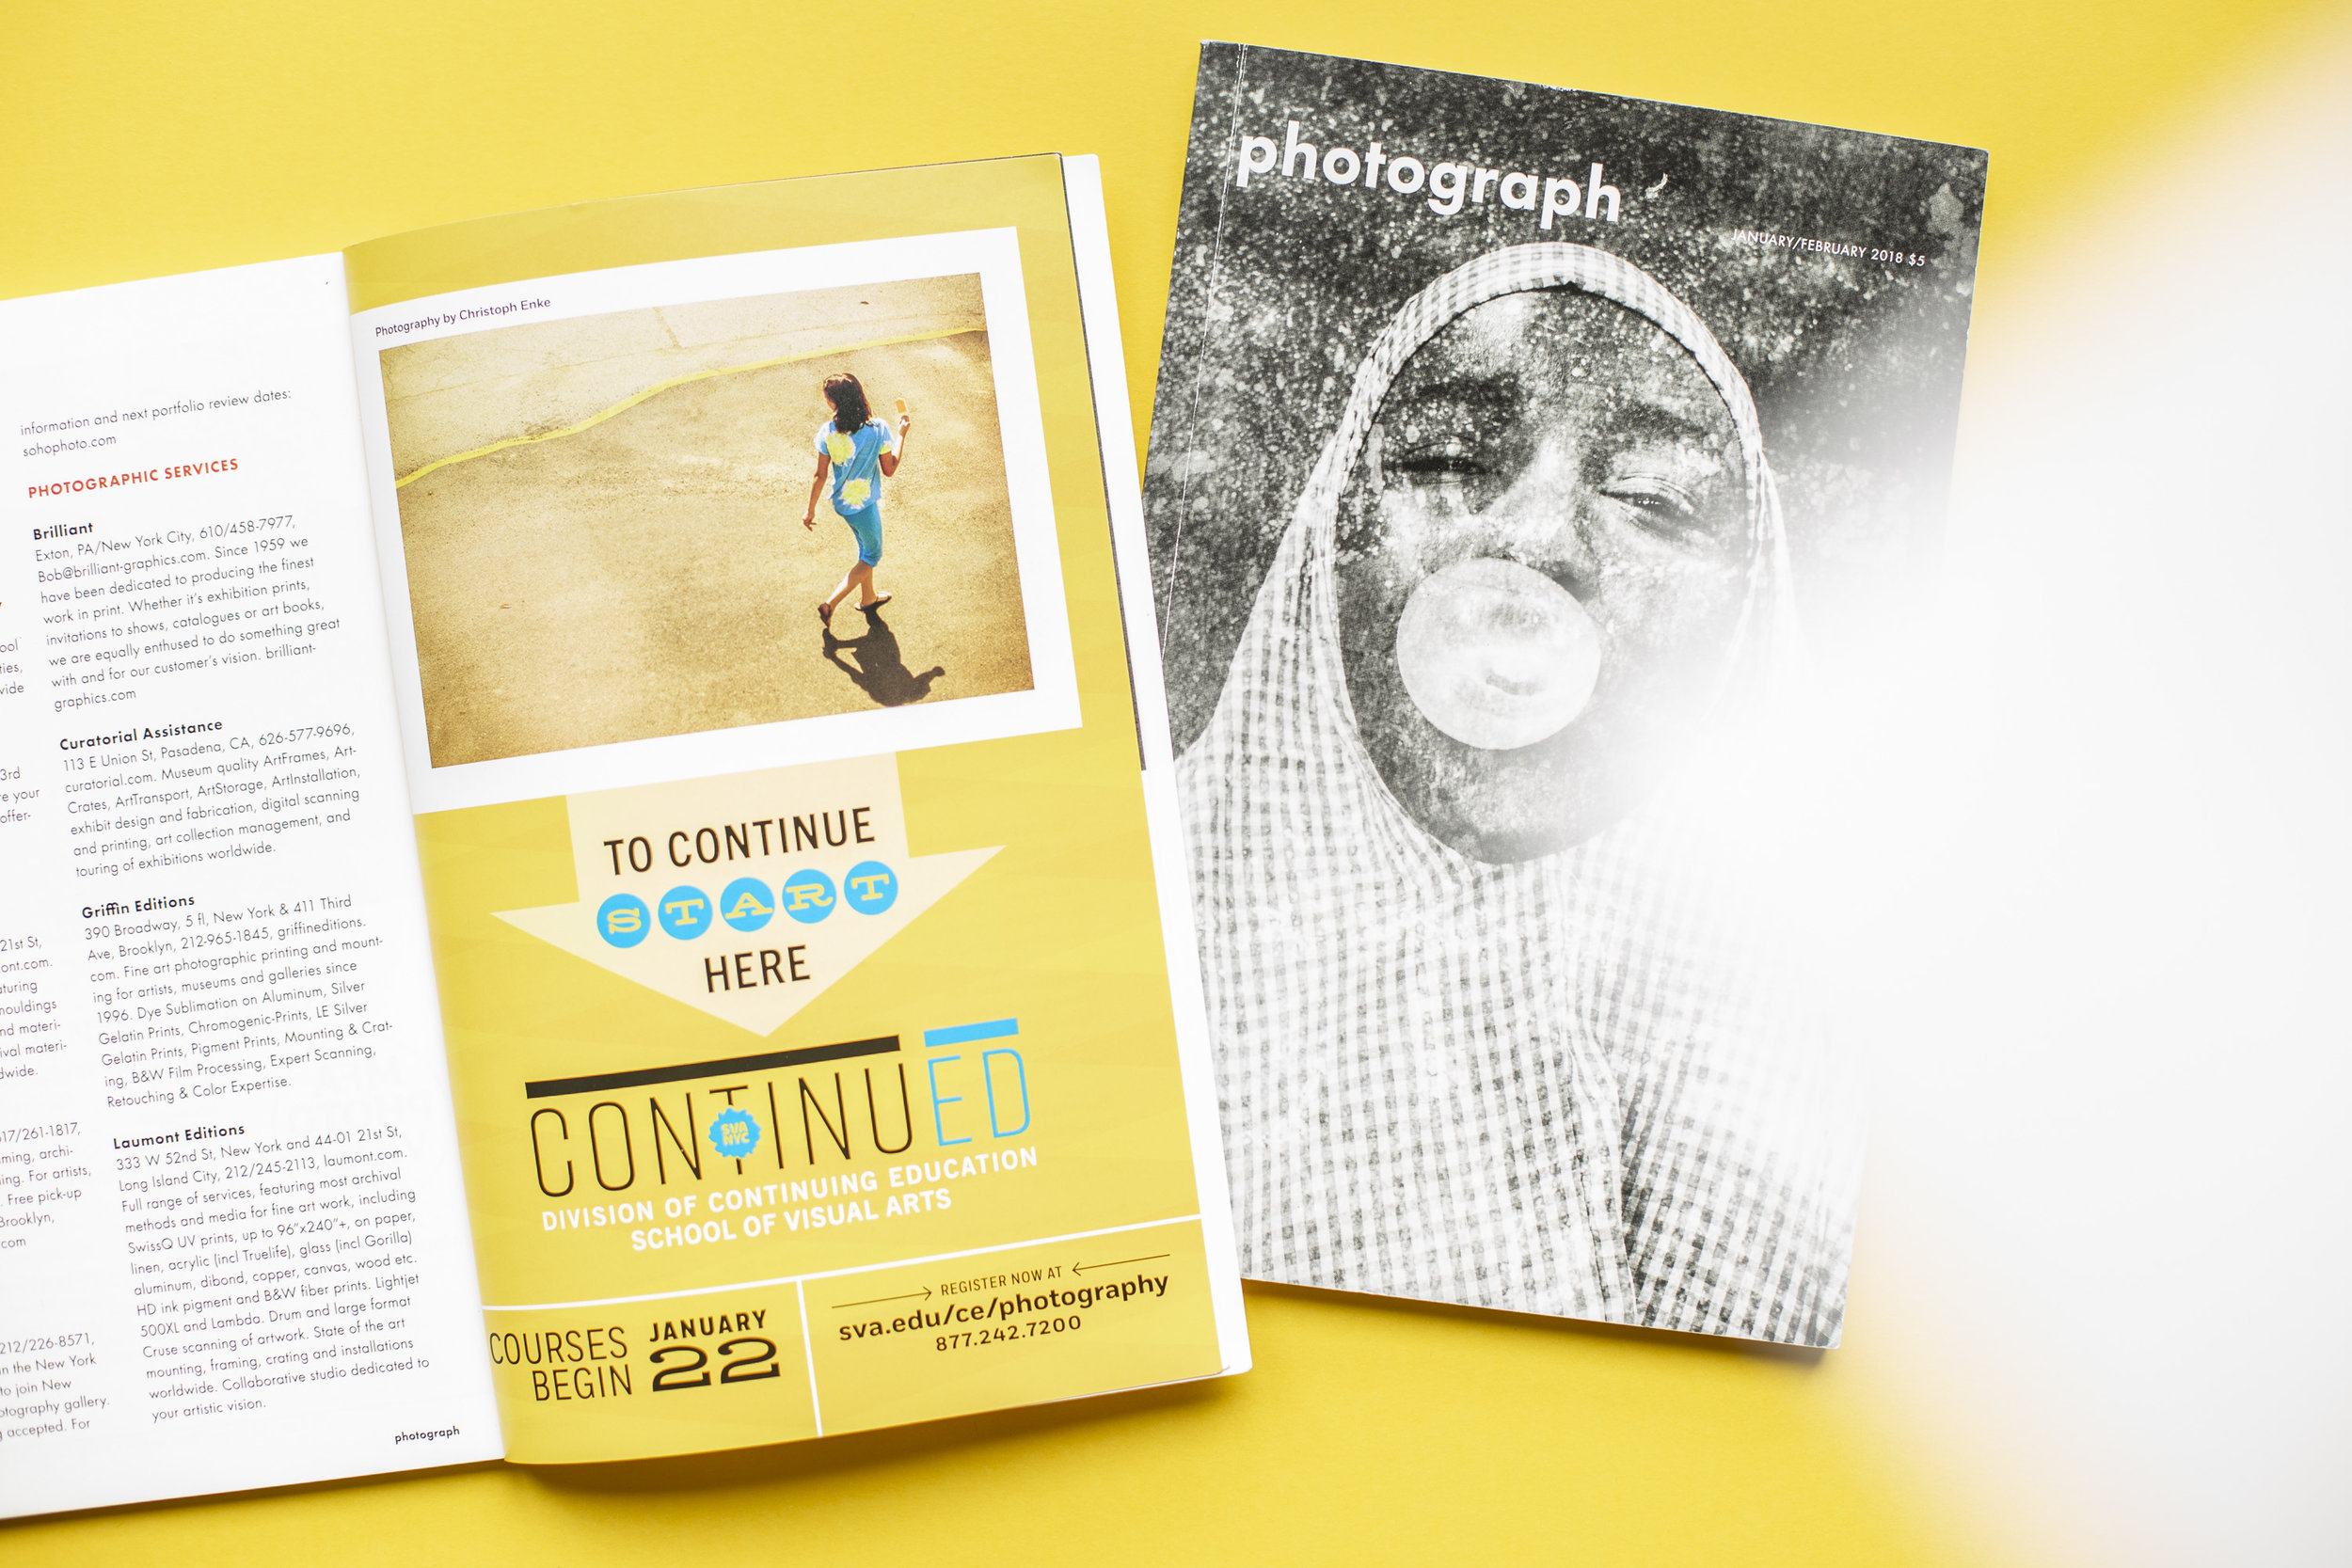 Werbung für  School of Visual Arts  NYC /  PHOTOGRAPH  Magazine  (USA)